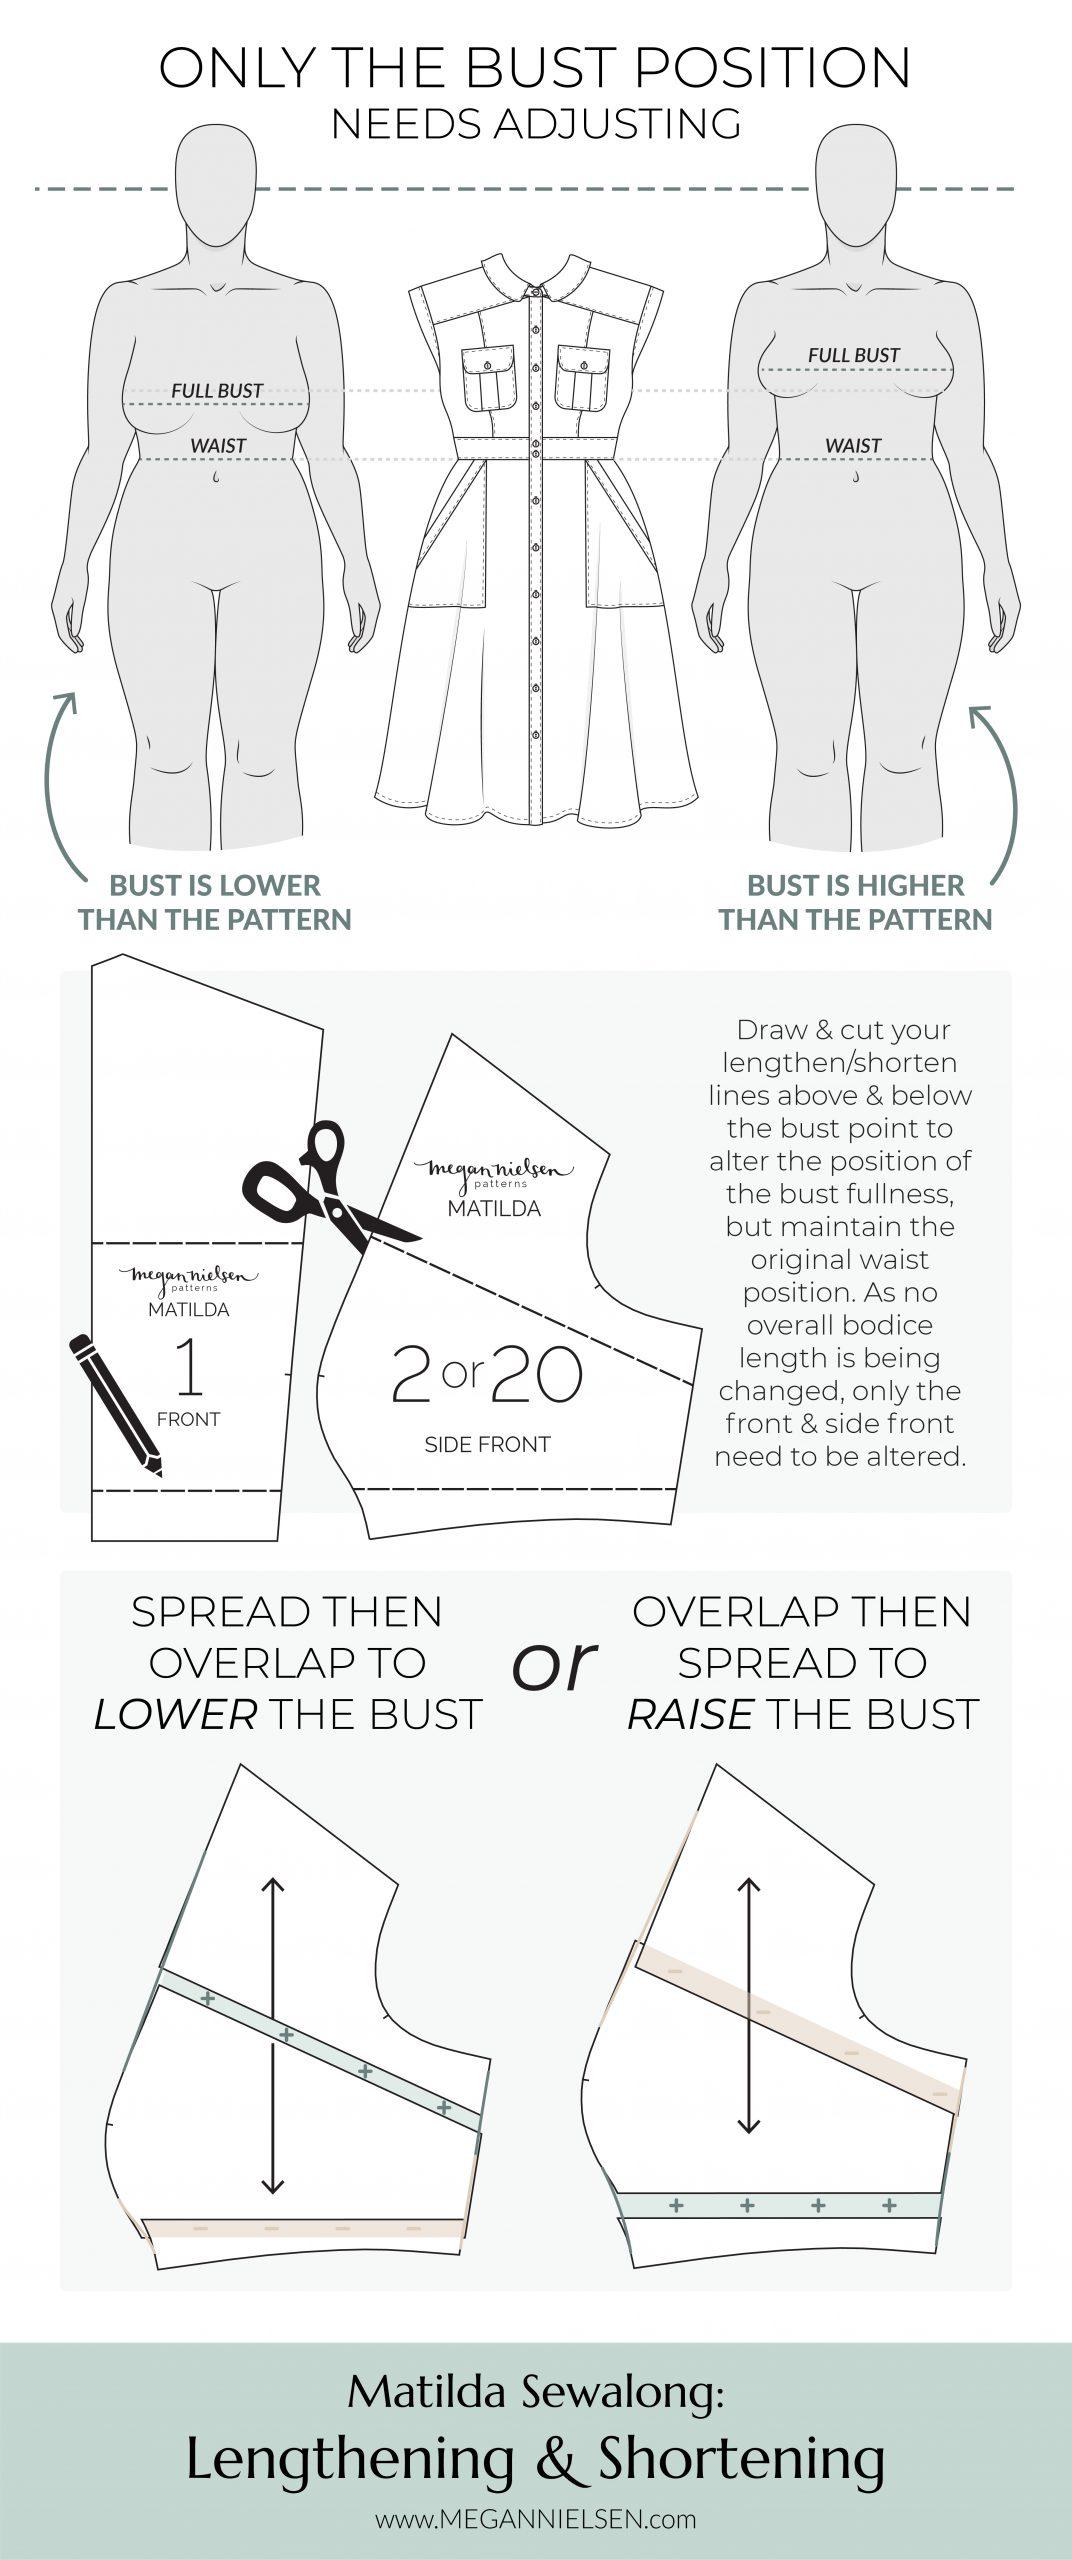 Megan Nielsen Patterns | Matilda Sewalong: Lengthening & Shortening - Adjusting The Bust Position